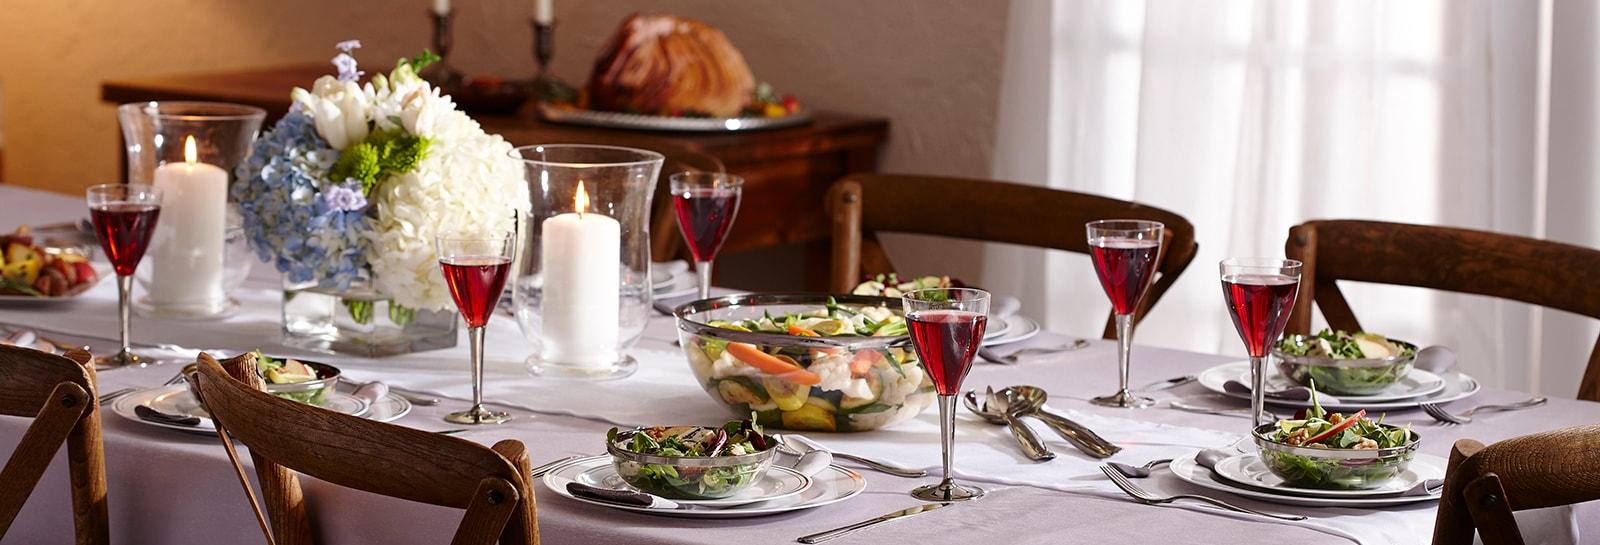 mozaik-classic パーティー食器